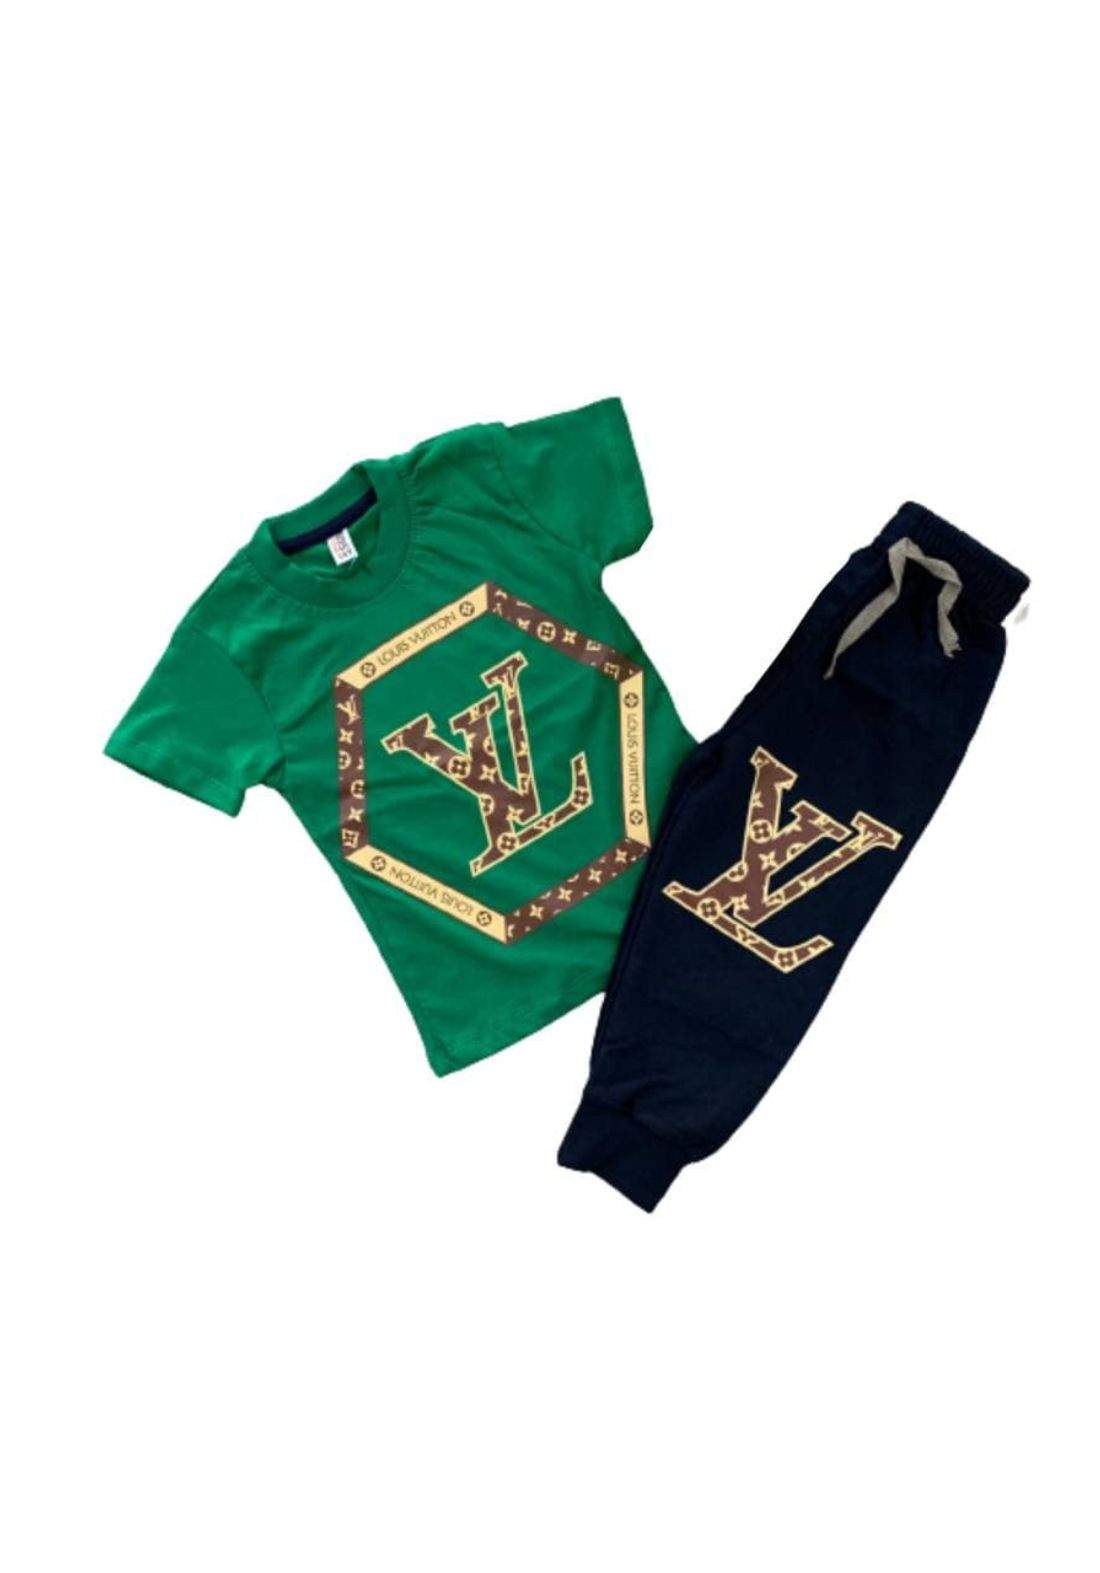 tracksuit for kids green (t-shirt+pijamas) ( تراكسوت اطفال خضر (بجامةو تيشيرت